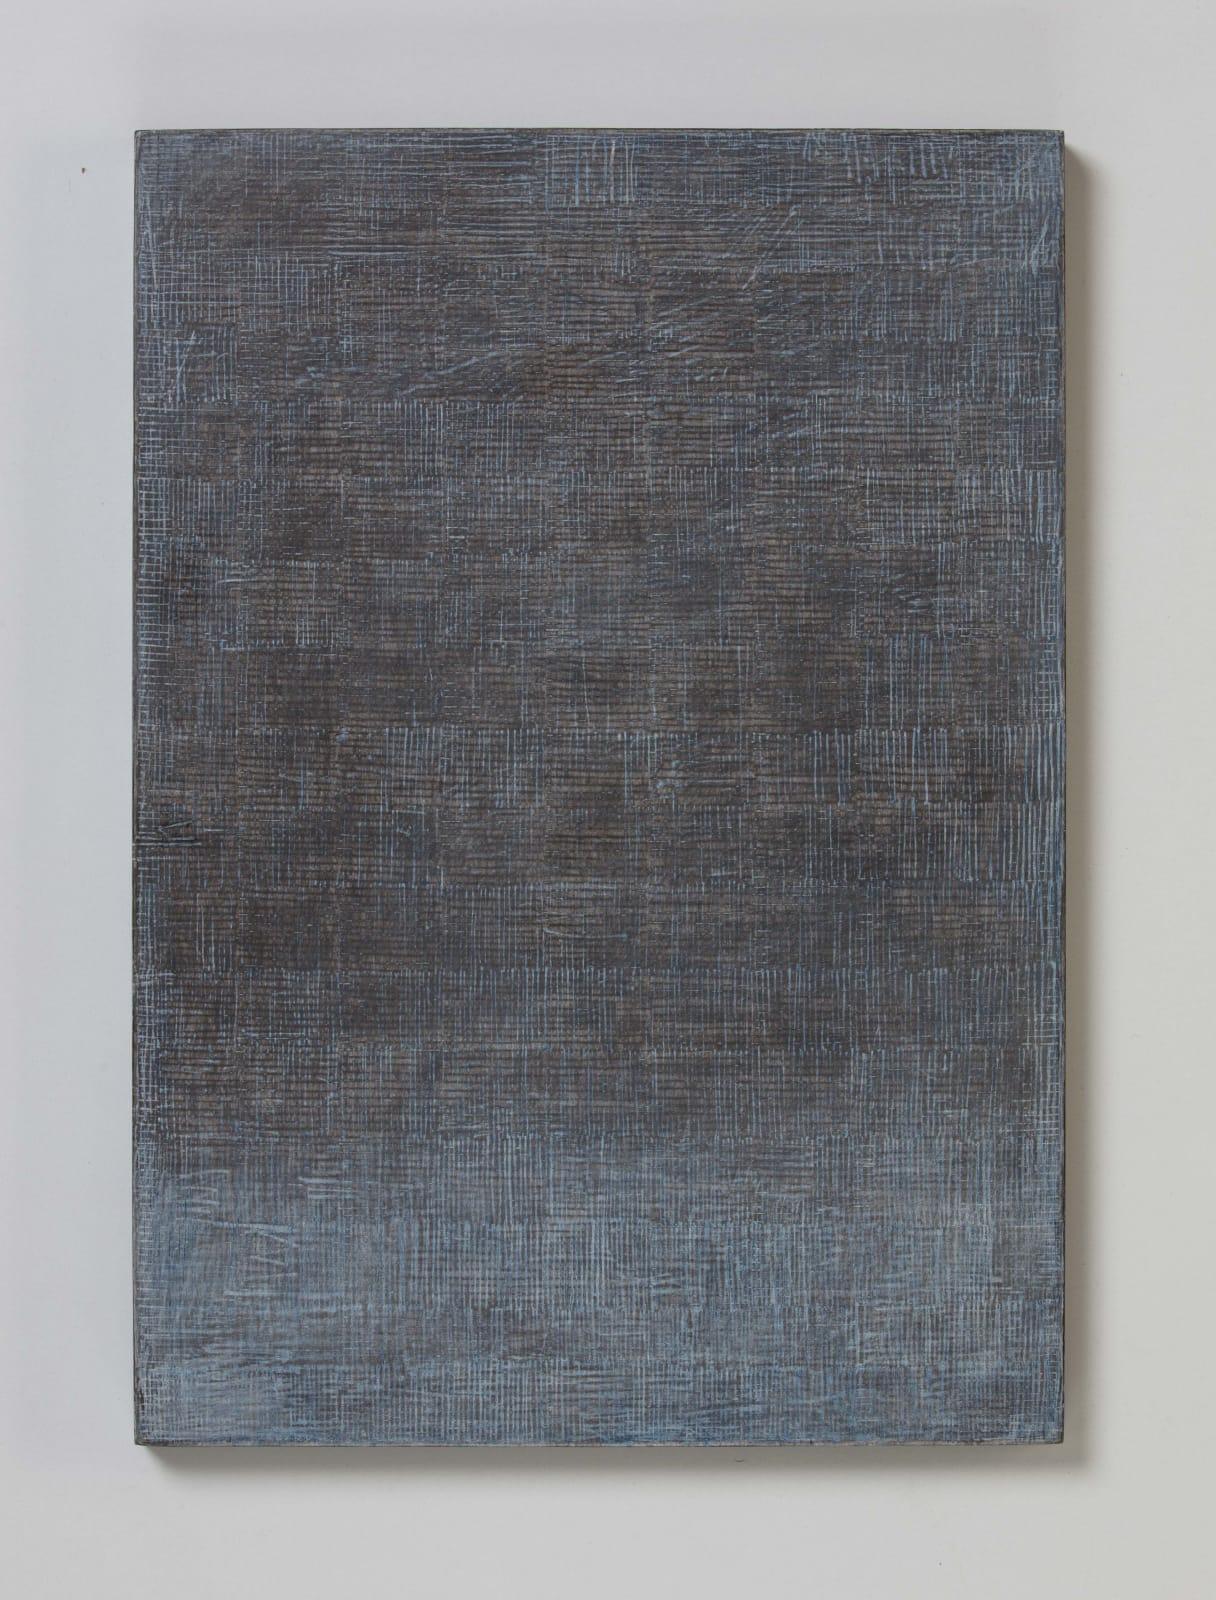 Moylisha 2020 oil on panel on wood 51.5 x 36.5 cm / 20 x 14 in